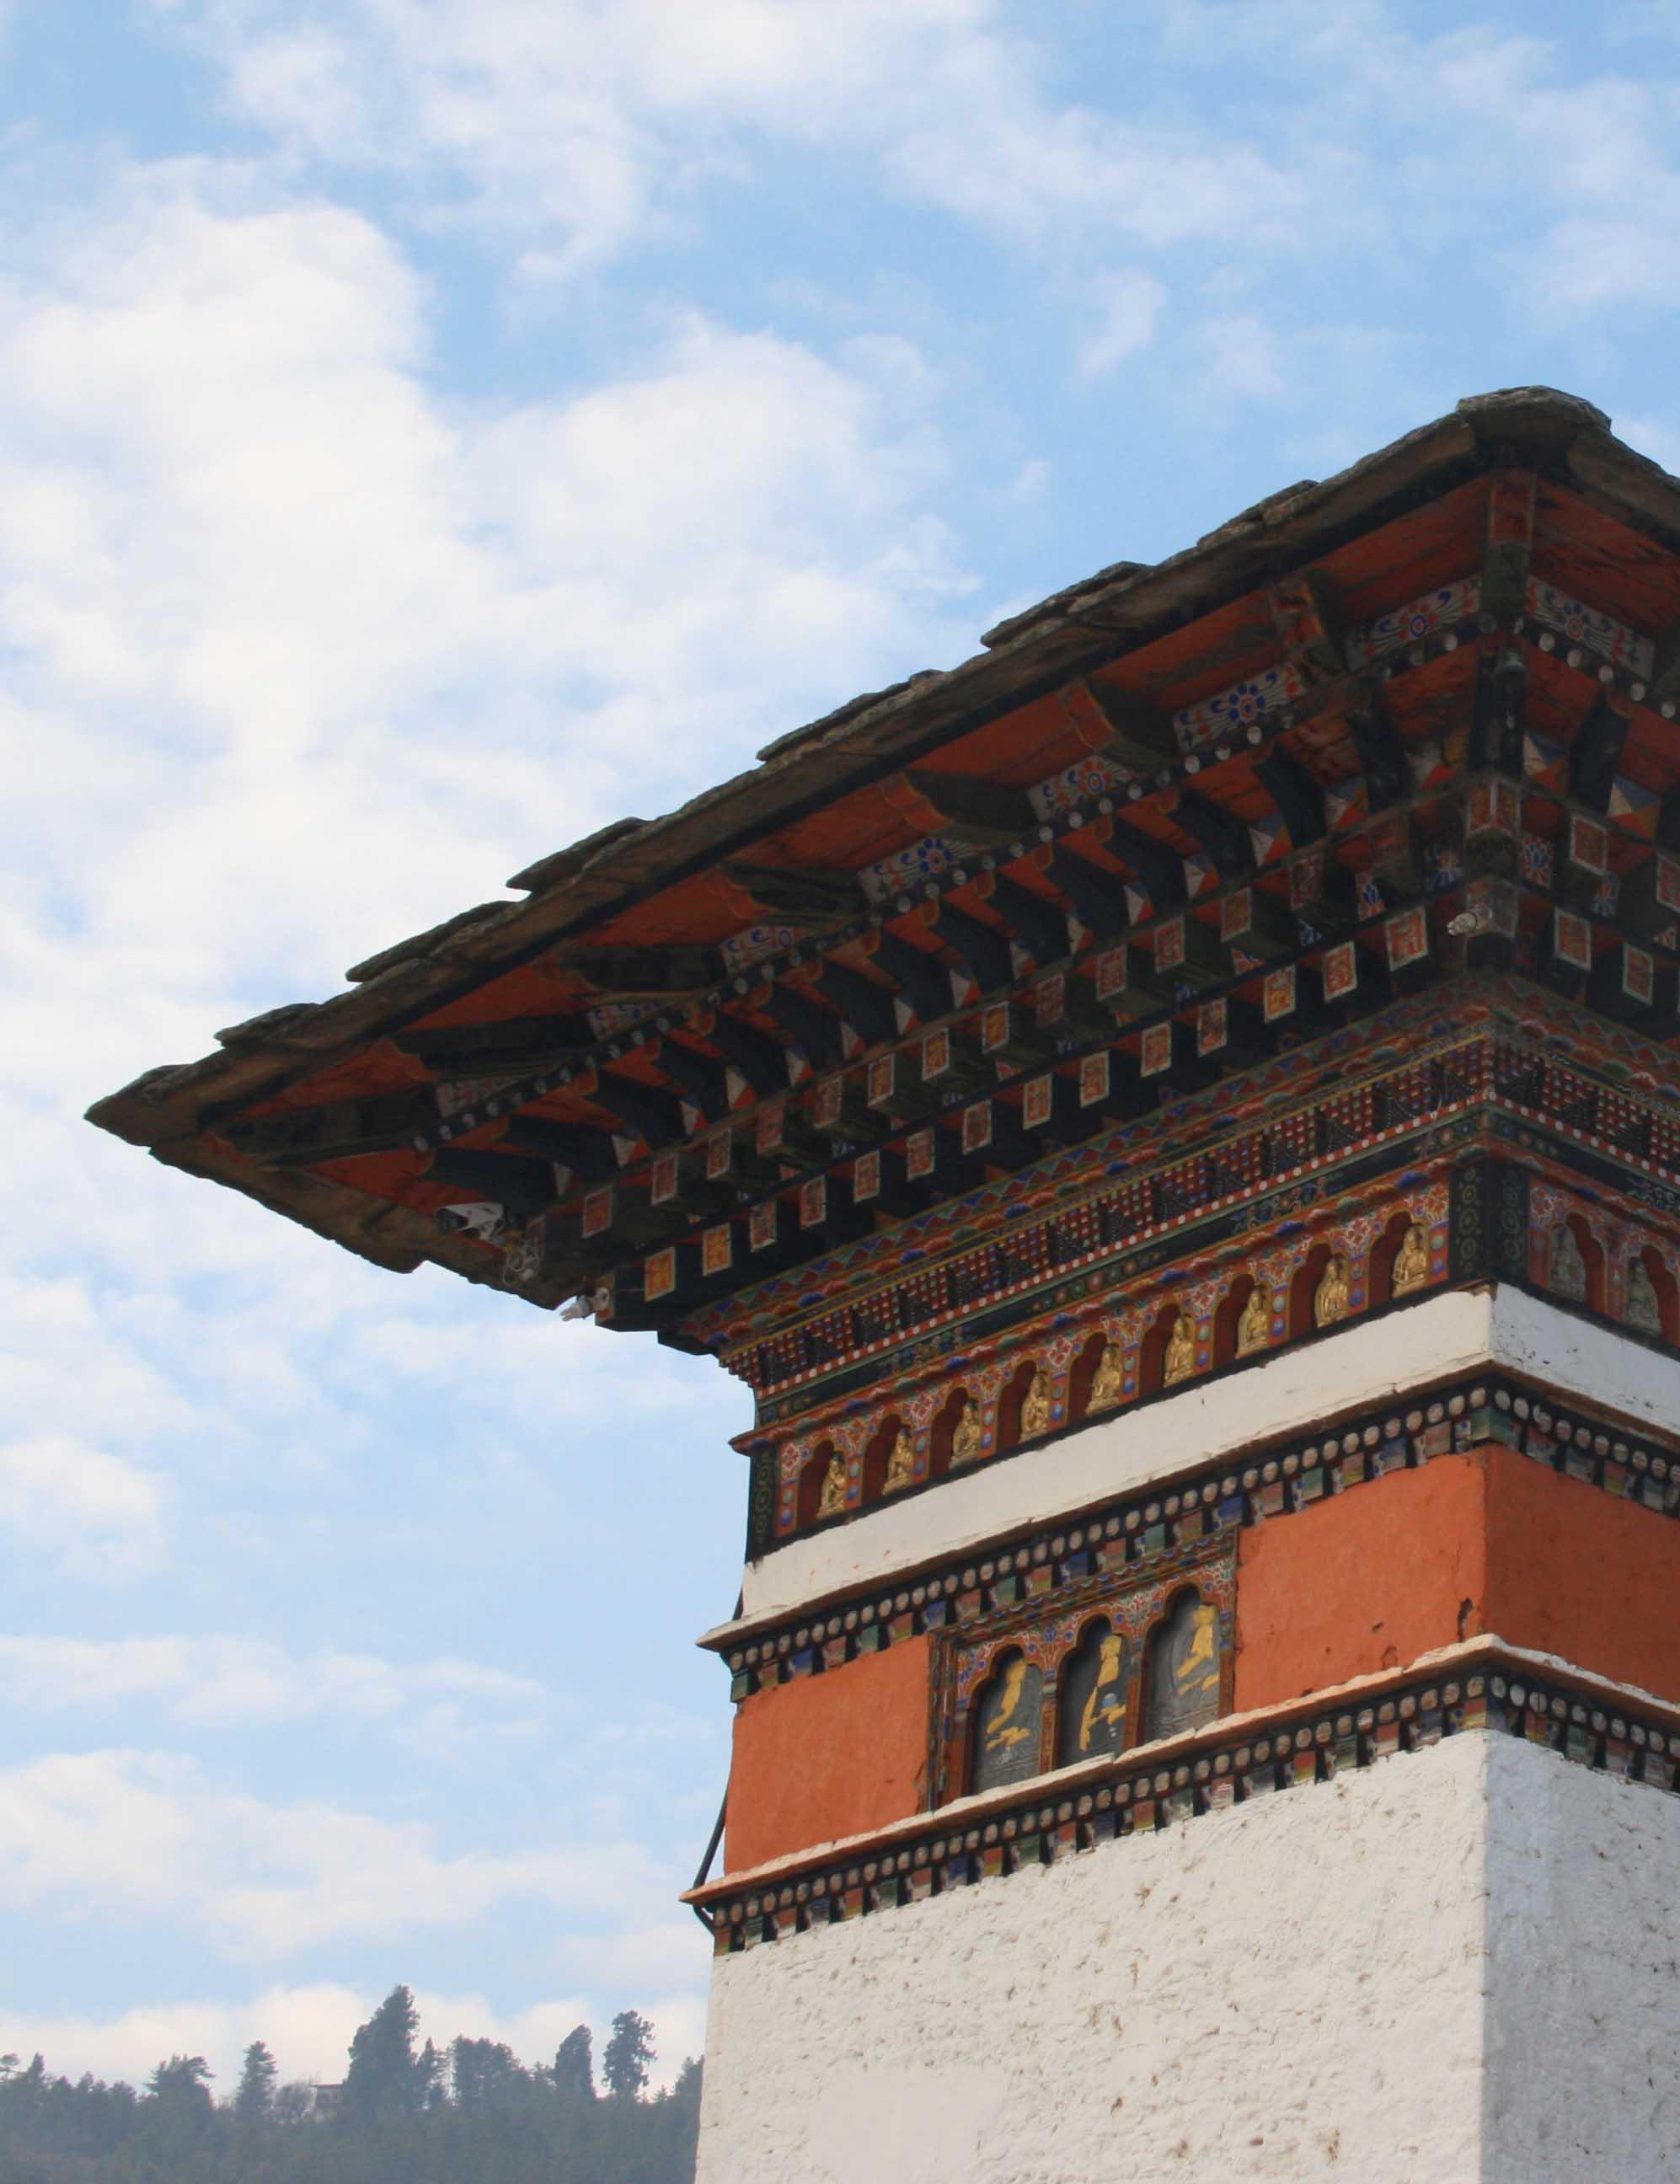 Temple Detail in Bhutan